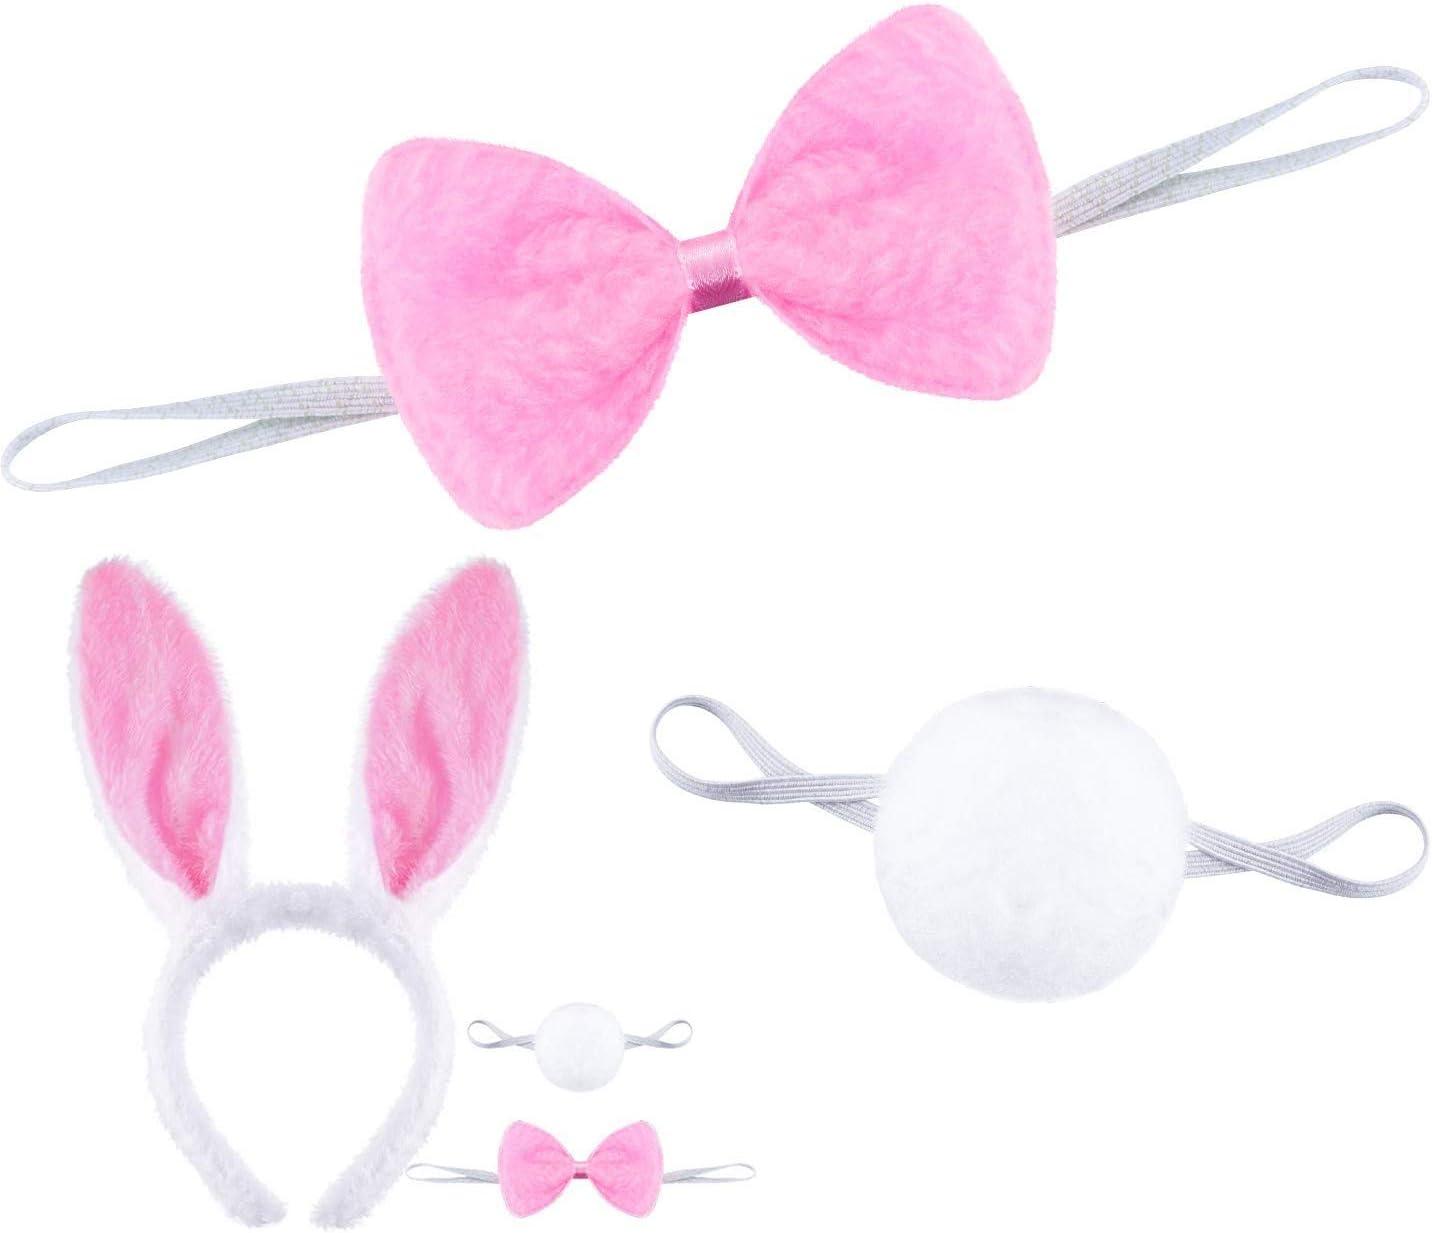 nasuniaoda 4 Sets Plush Bunny Ears Headbands Rabbit Ear Hairband Bow Ties and Tail Set Dress Costume Accessory for Halloween Easter Costume Party